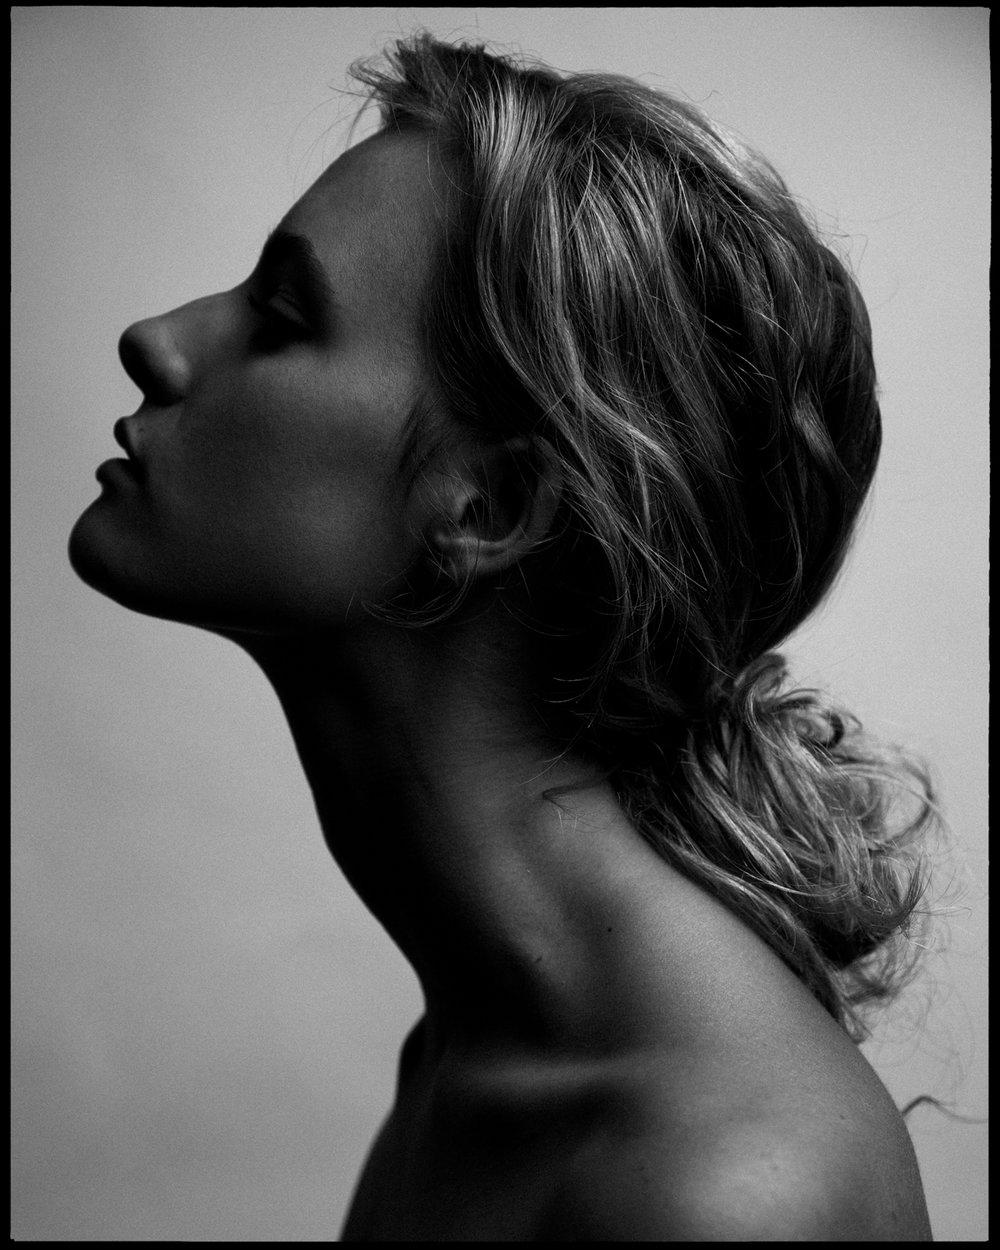 2_Sydney_Studio_Canon_5D_MKIV_Copyright_Taylor_Noel_Photography_NYC.jpg